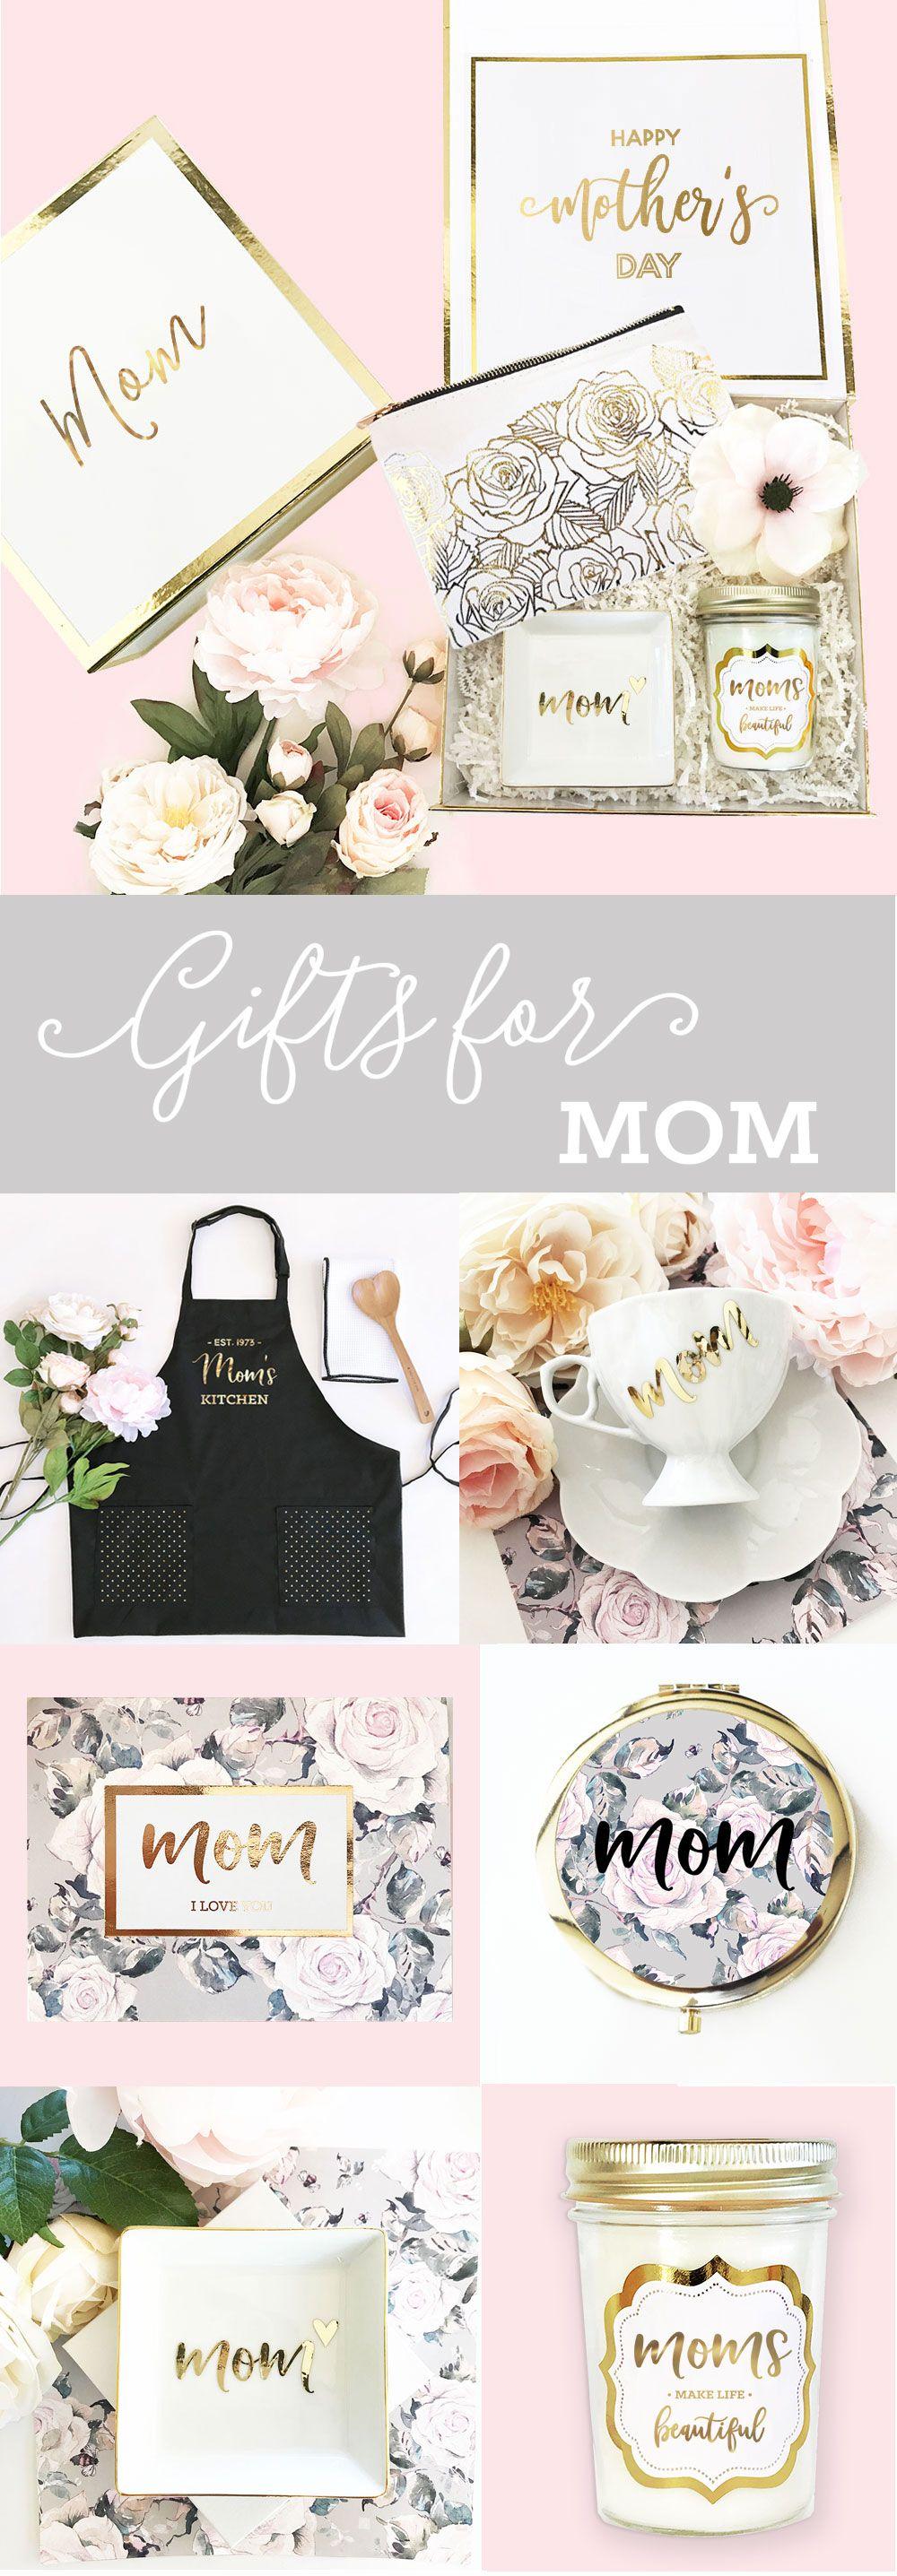 Mom Ring Dish  Wedding Tribe Wedding Details  Pinterest  Mom